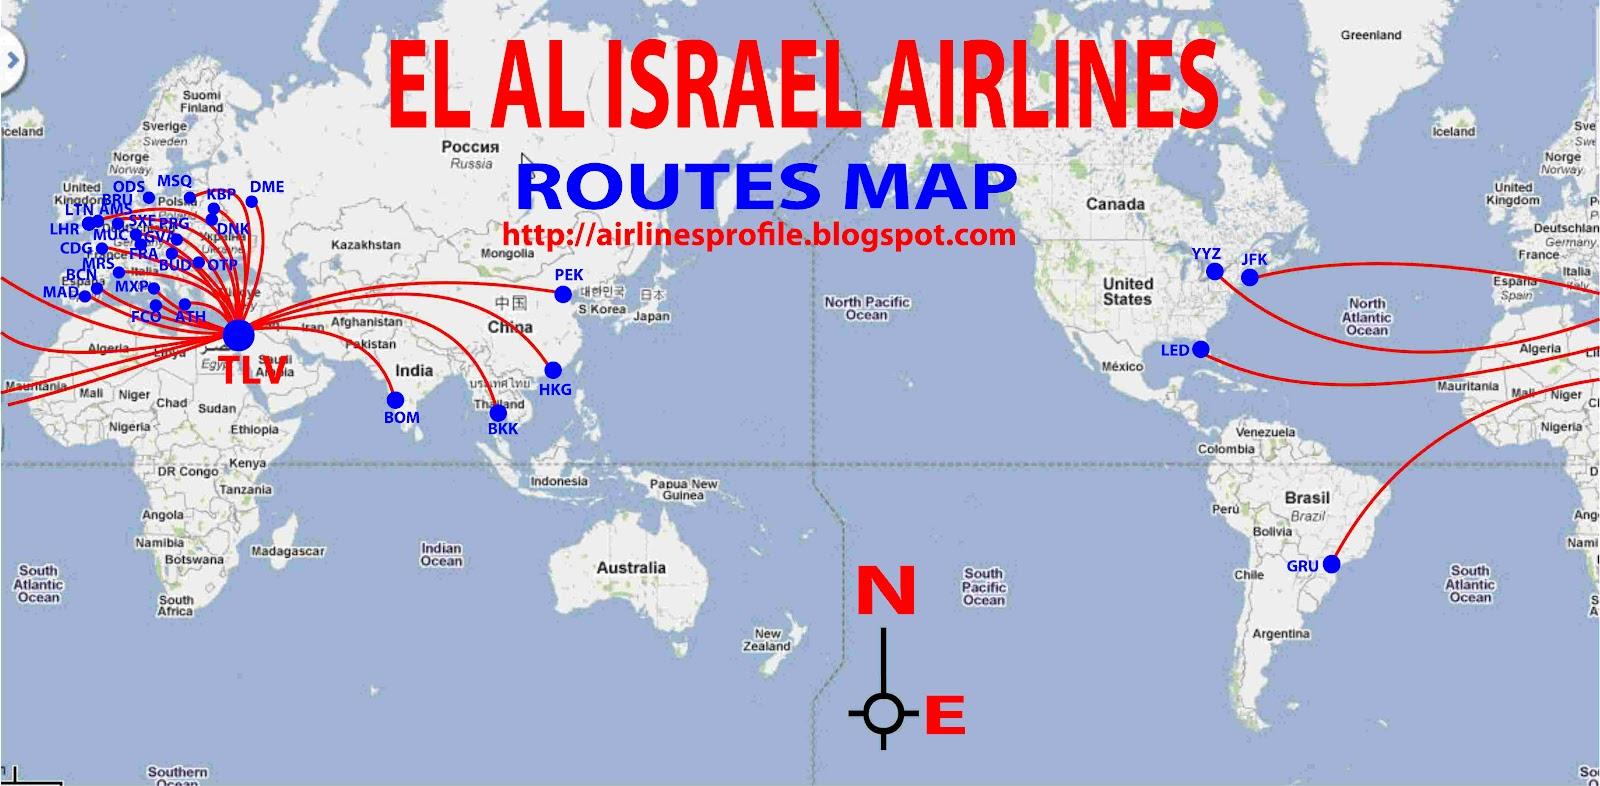 el al airlines el al airlines routes map